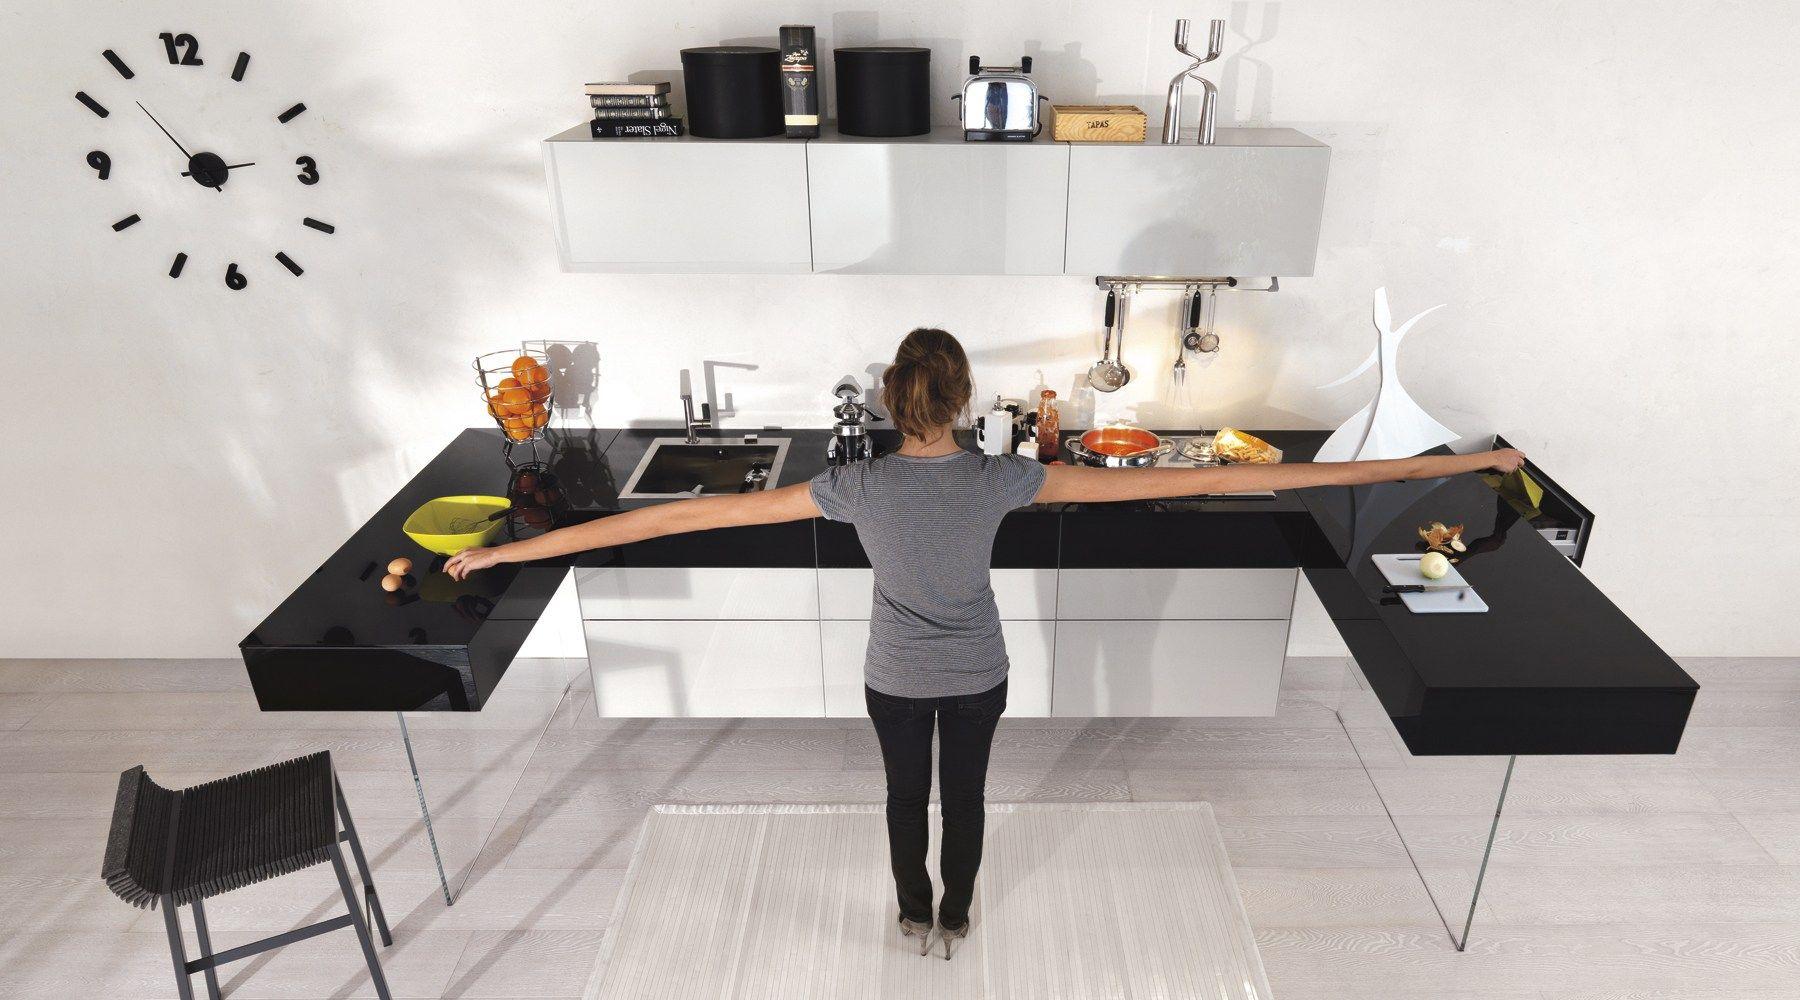 36e8 cuisine avec p ninsule by lago design daniele lago. Black Bedroom Furniture Sets. Home Design Ideas